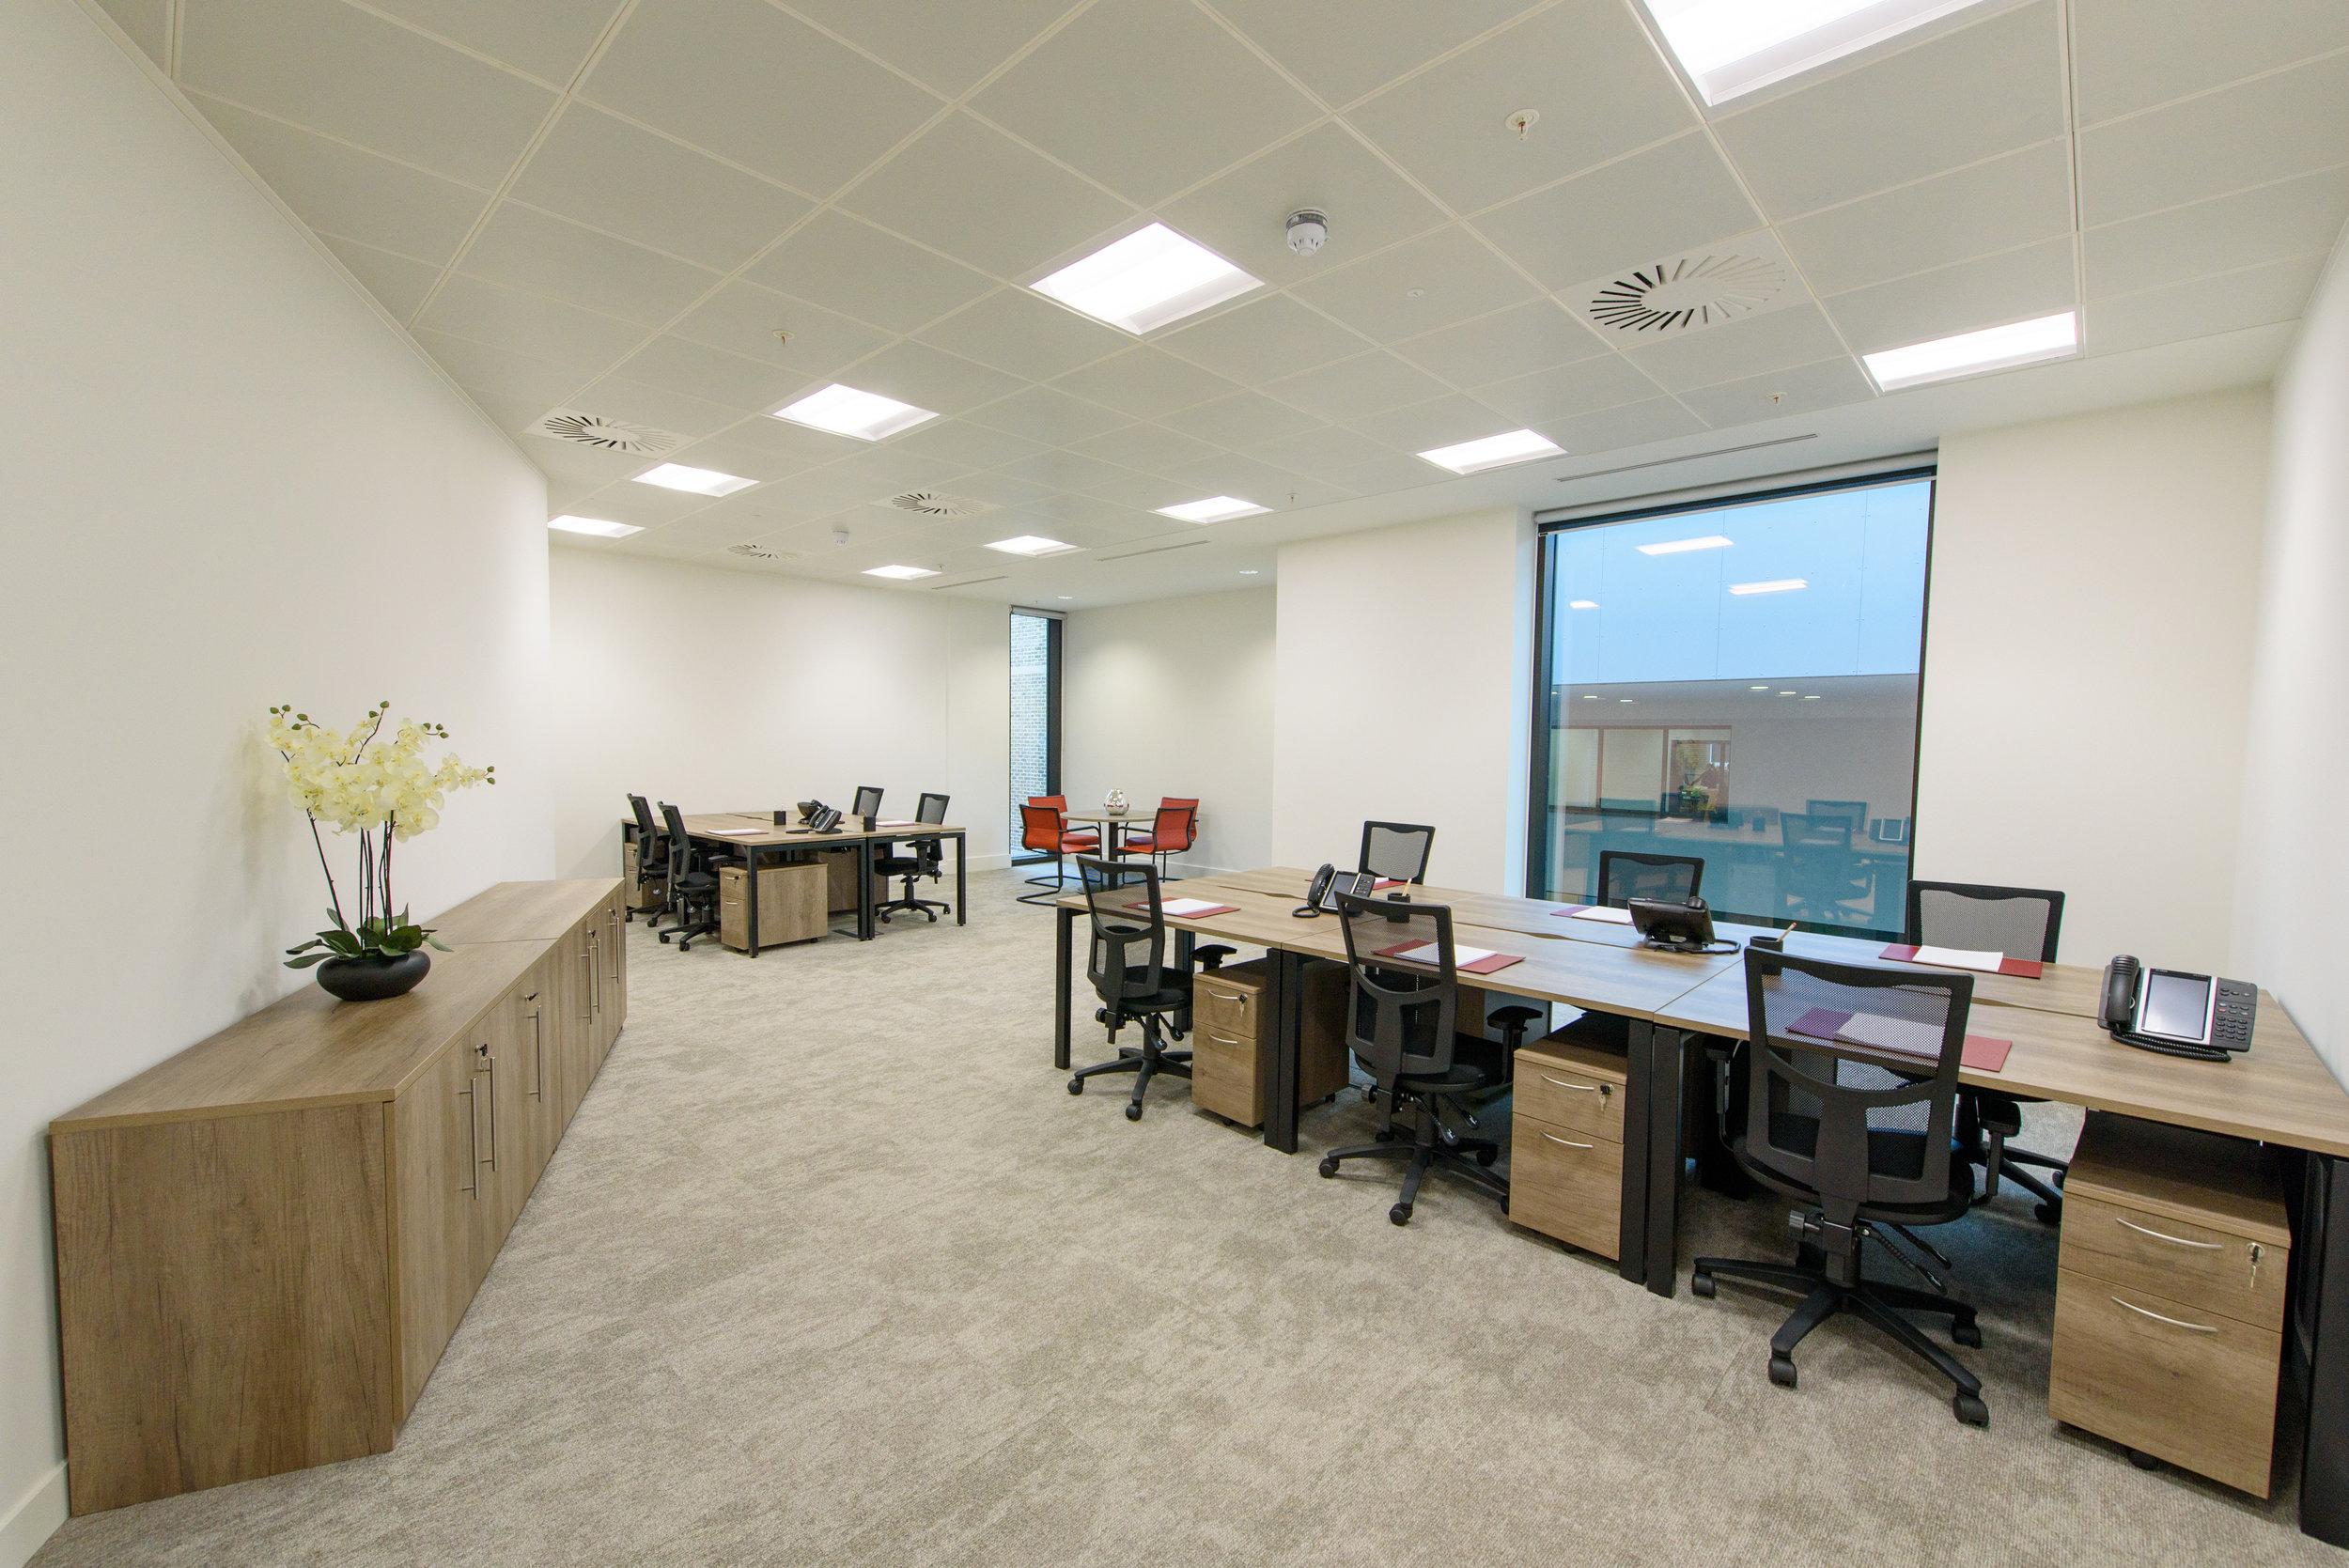 Virtual office - Coming soon